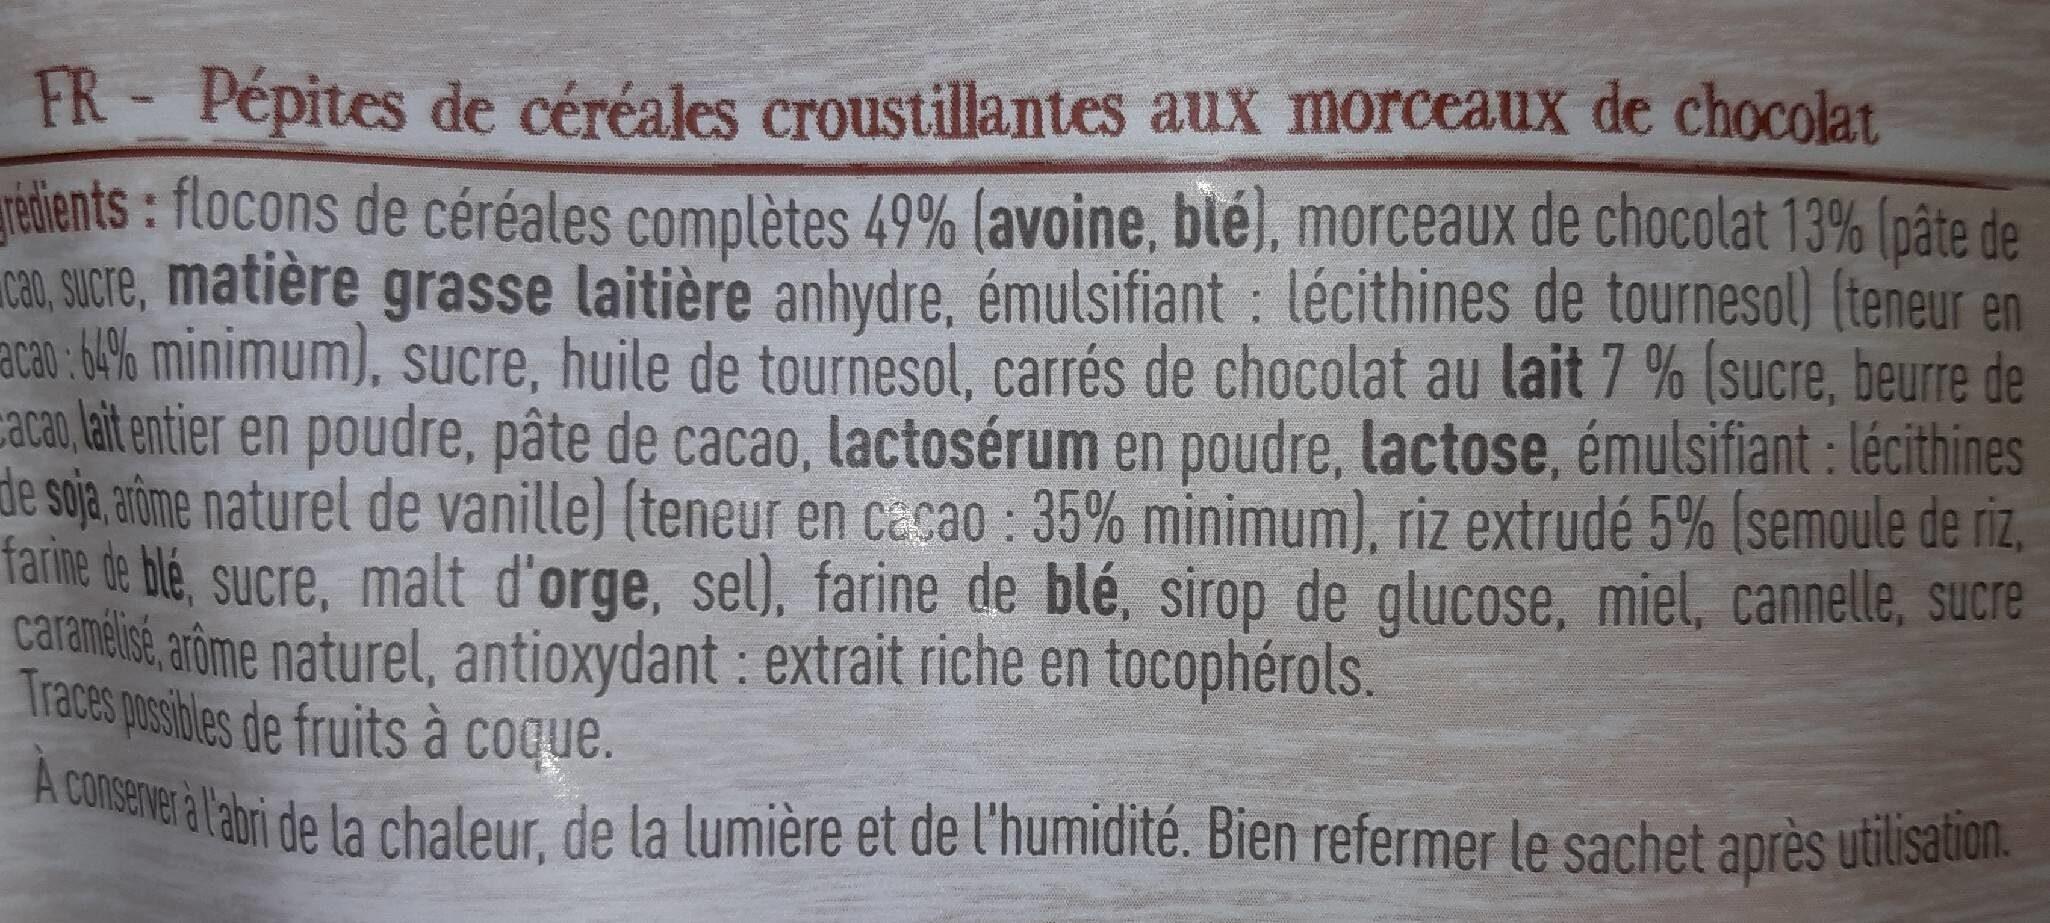 Muesli crunchy - Ingrédients - fr